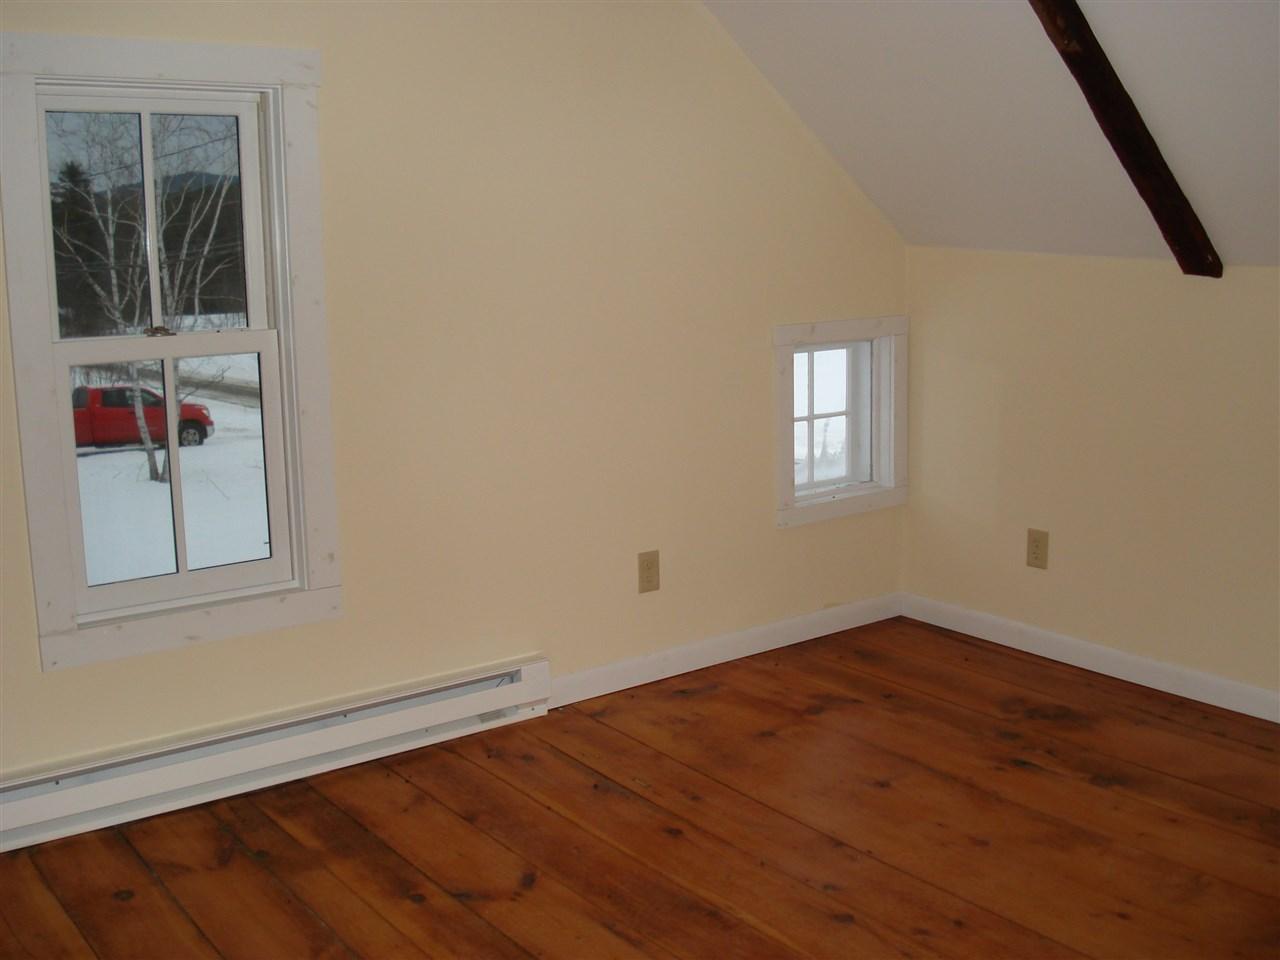 2nd Bedroom - upstairs.